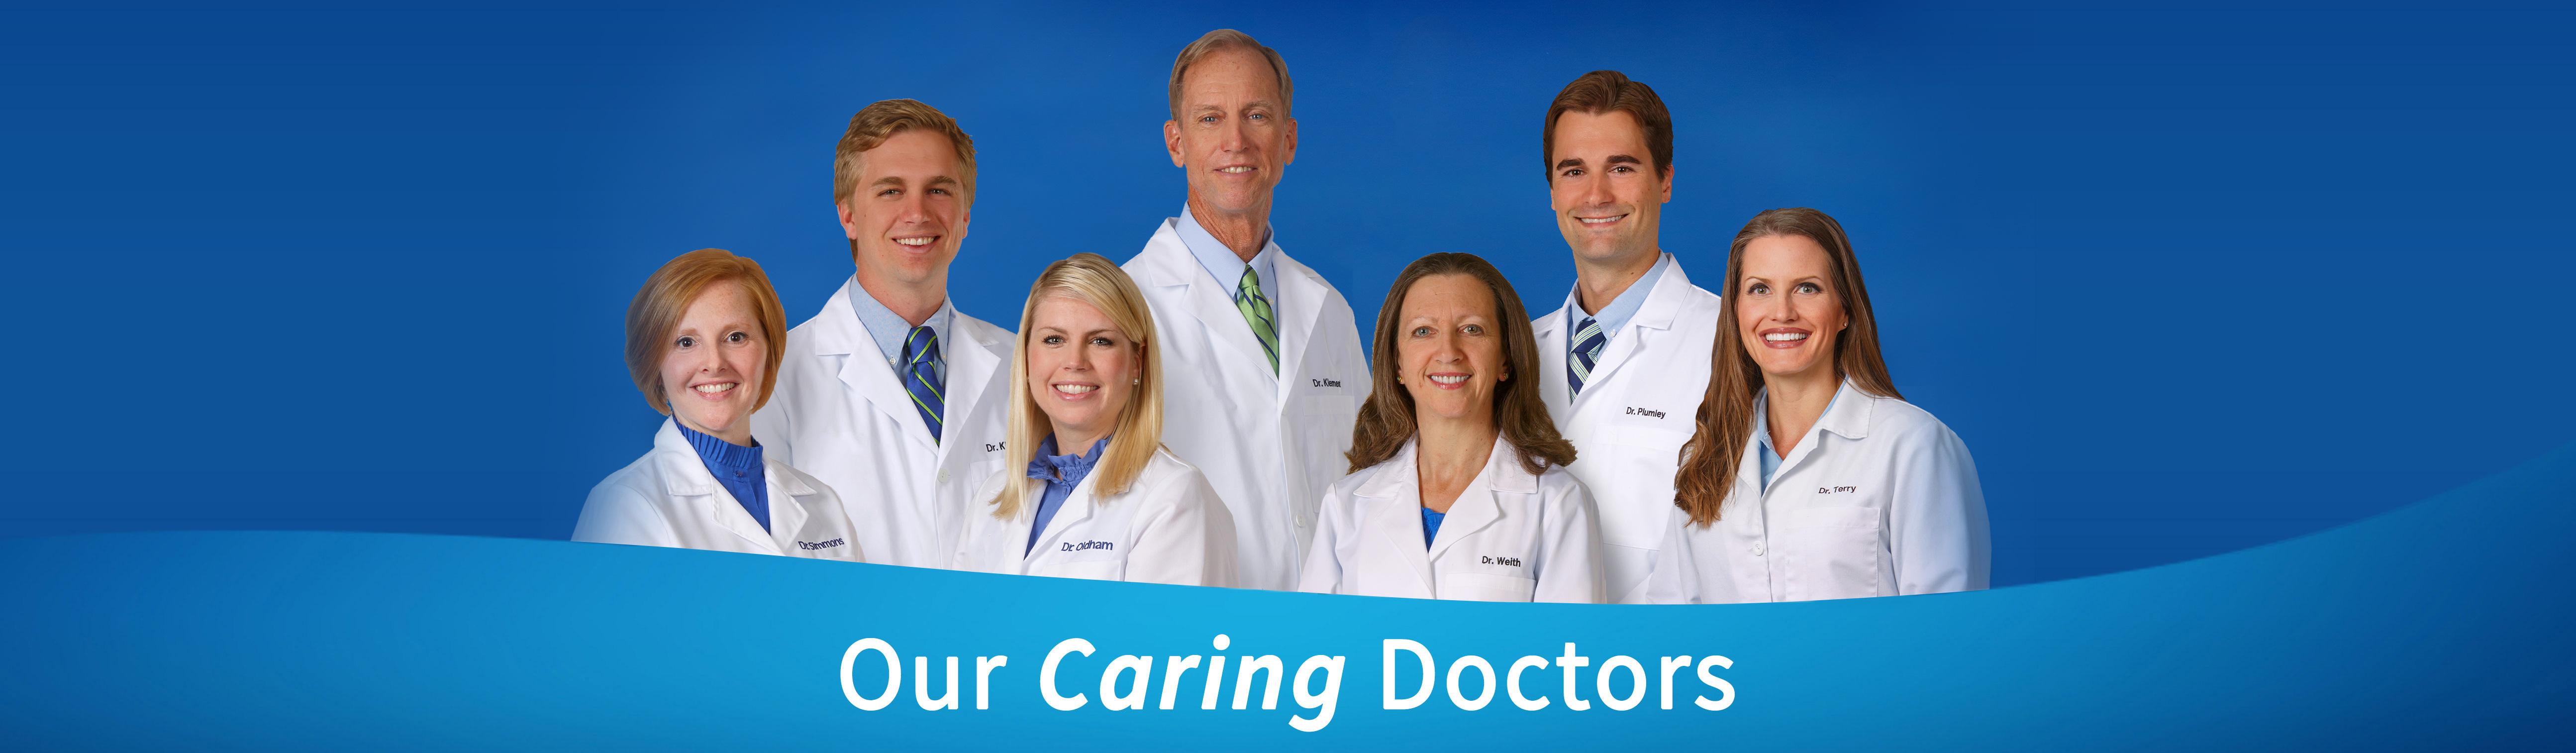 Klement Family Dental reviews | Dental Hygienists at 425 22nd Ave N - St. Petersburg FL